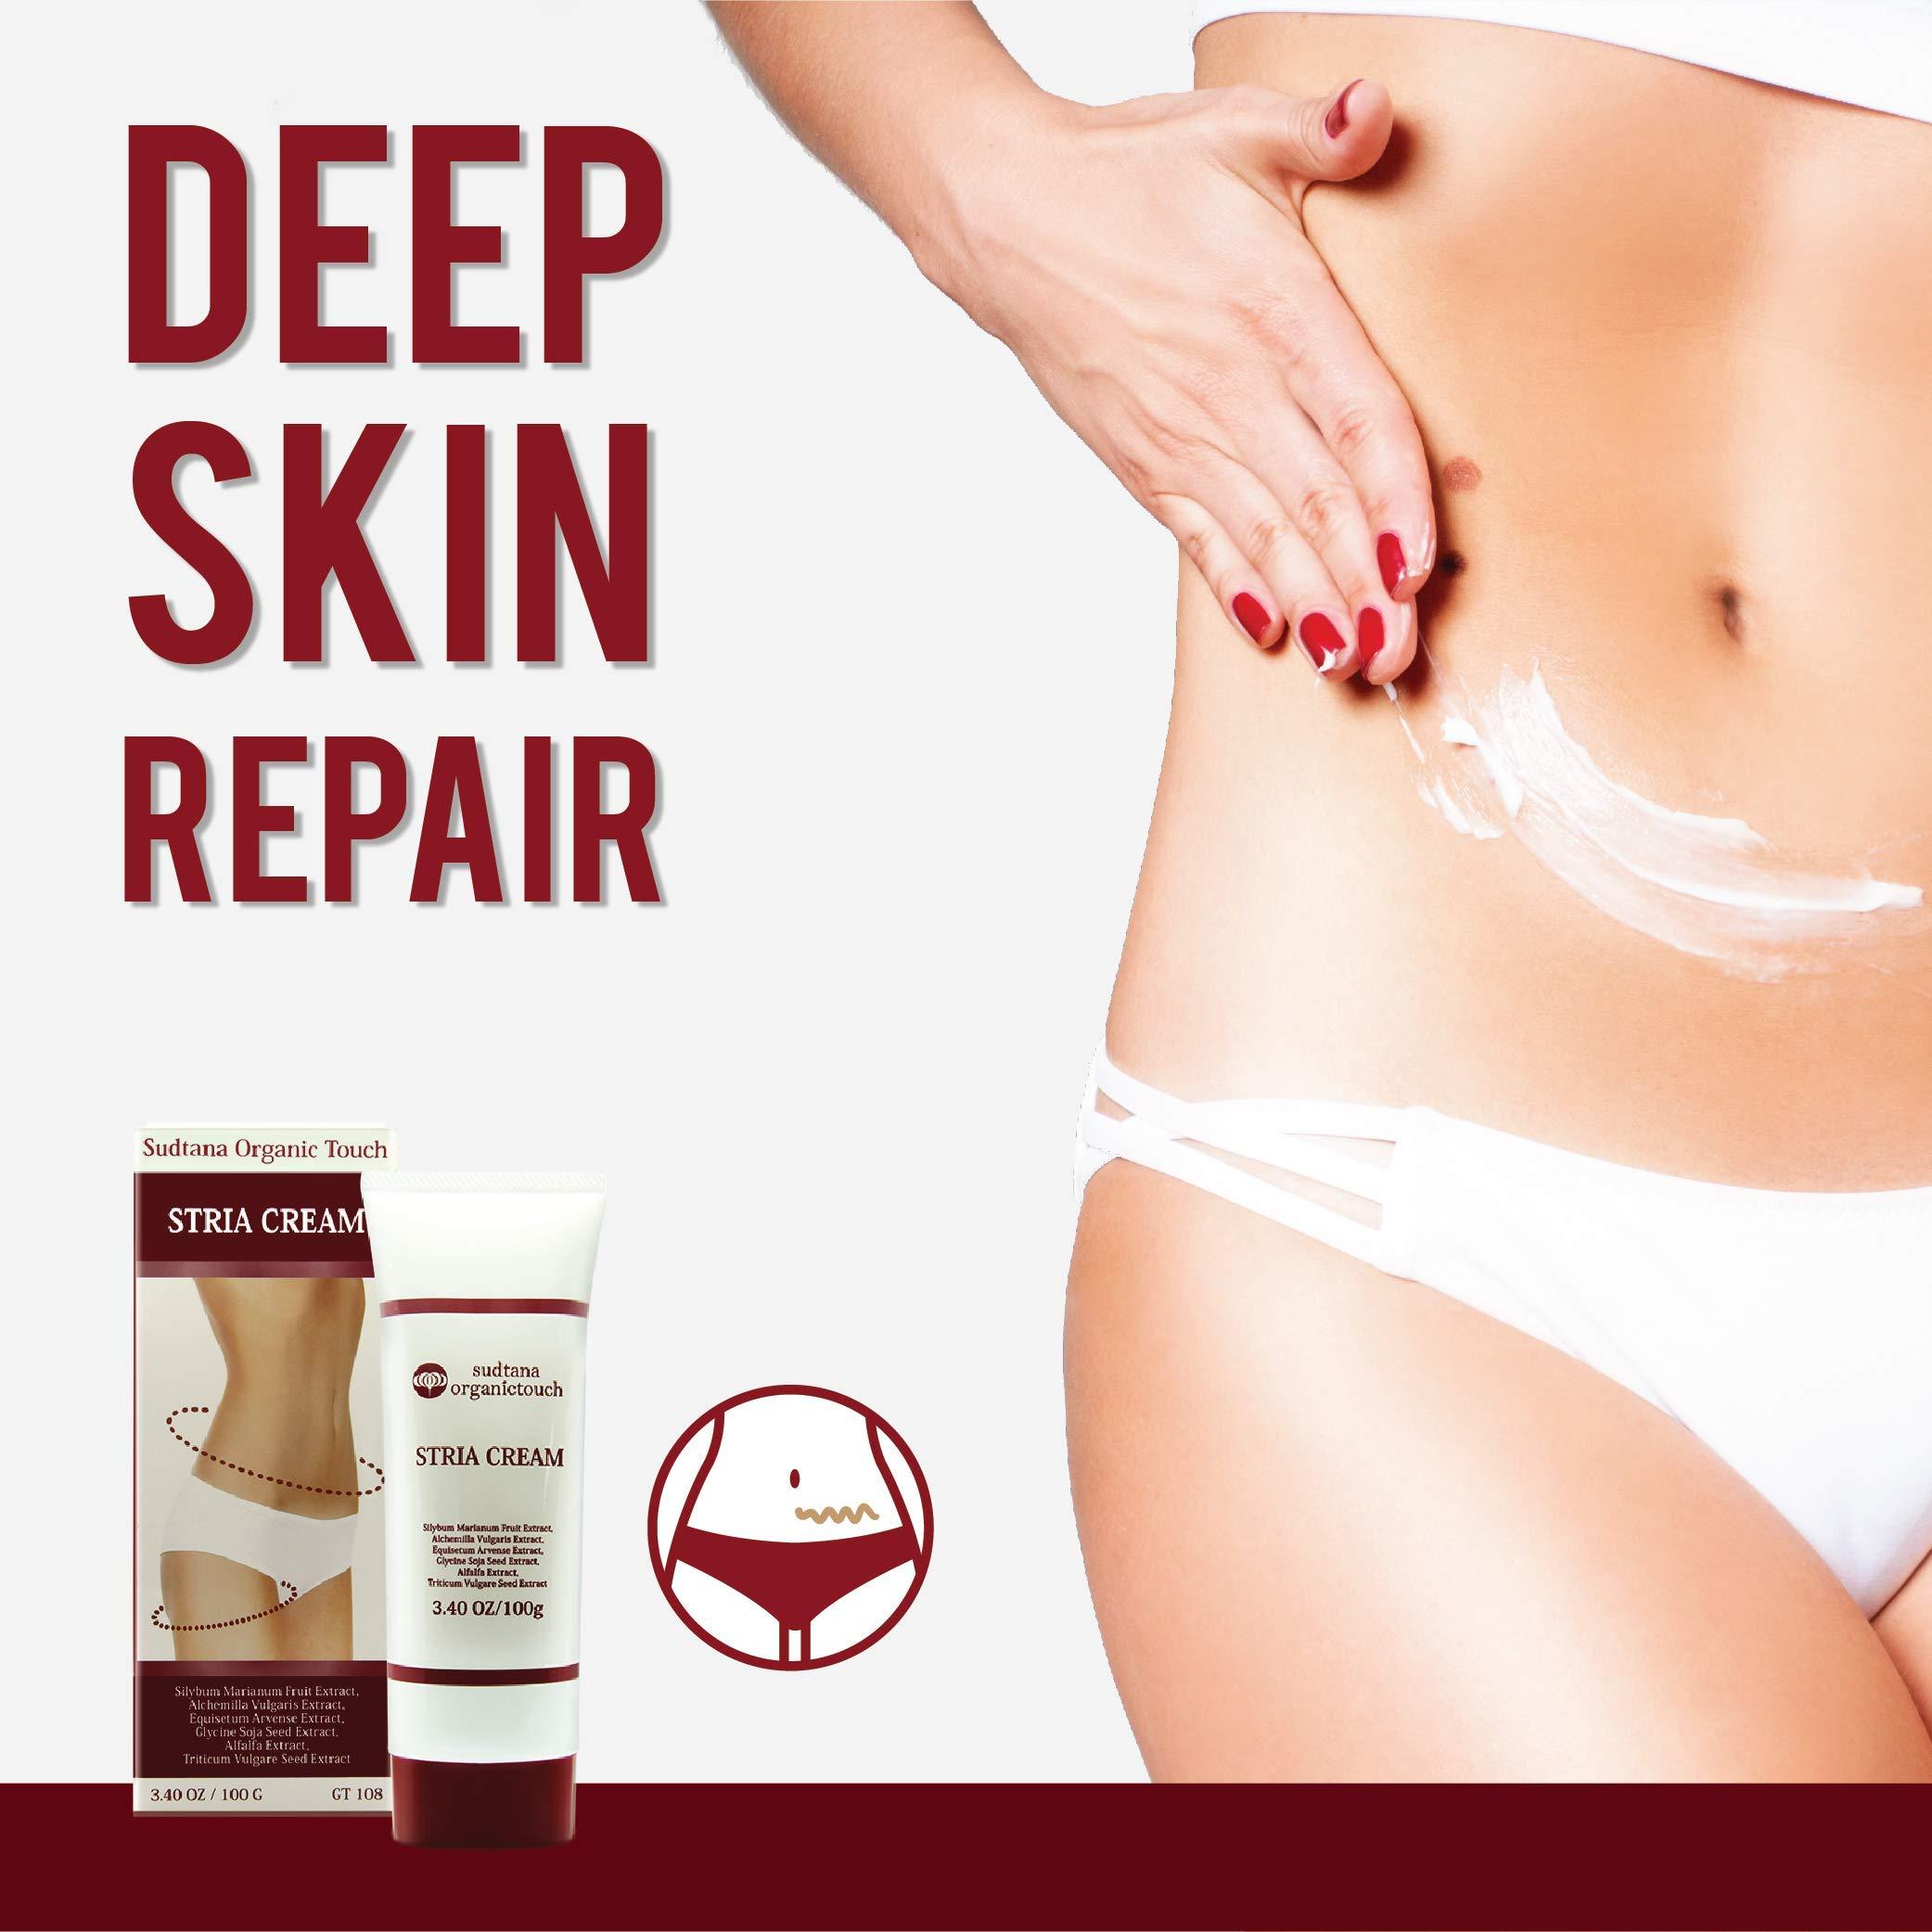 STRIA Natural Stretch Marks, Scar & Dark Spot Remover   Stretch Mark Cream for Skin Hydration, Exfoliation, Tightening & Collagen Boost   Pregnancy Belly Care for Prenatal-Postnatal & Pregnant   3 pcs by GreenTouch (Image #4)